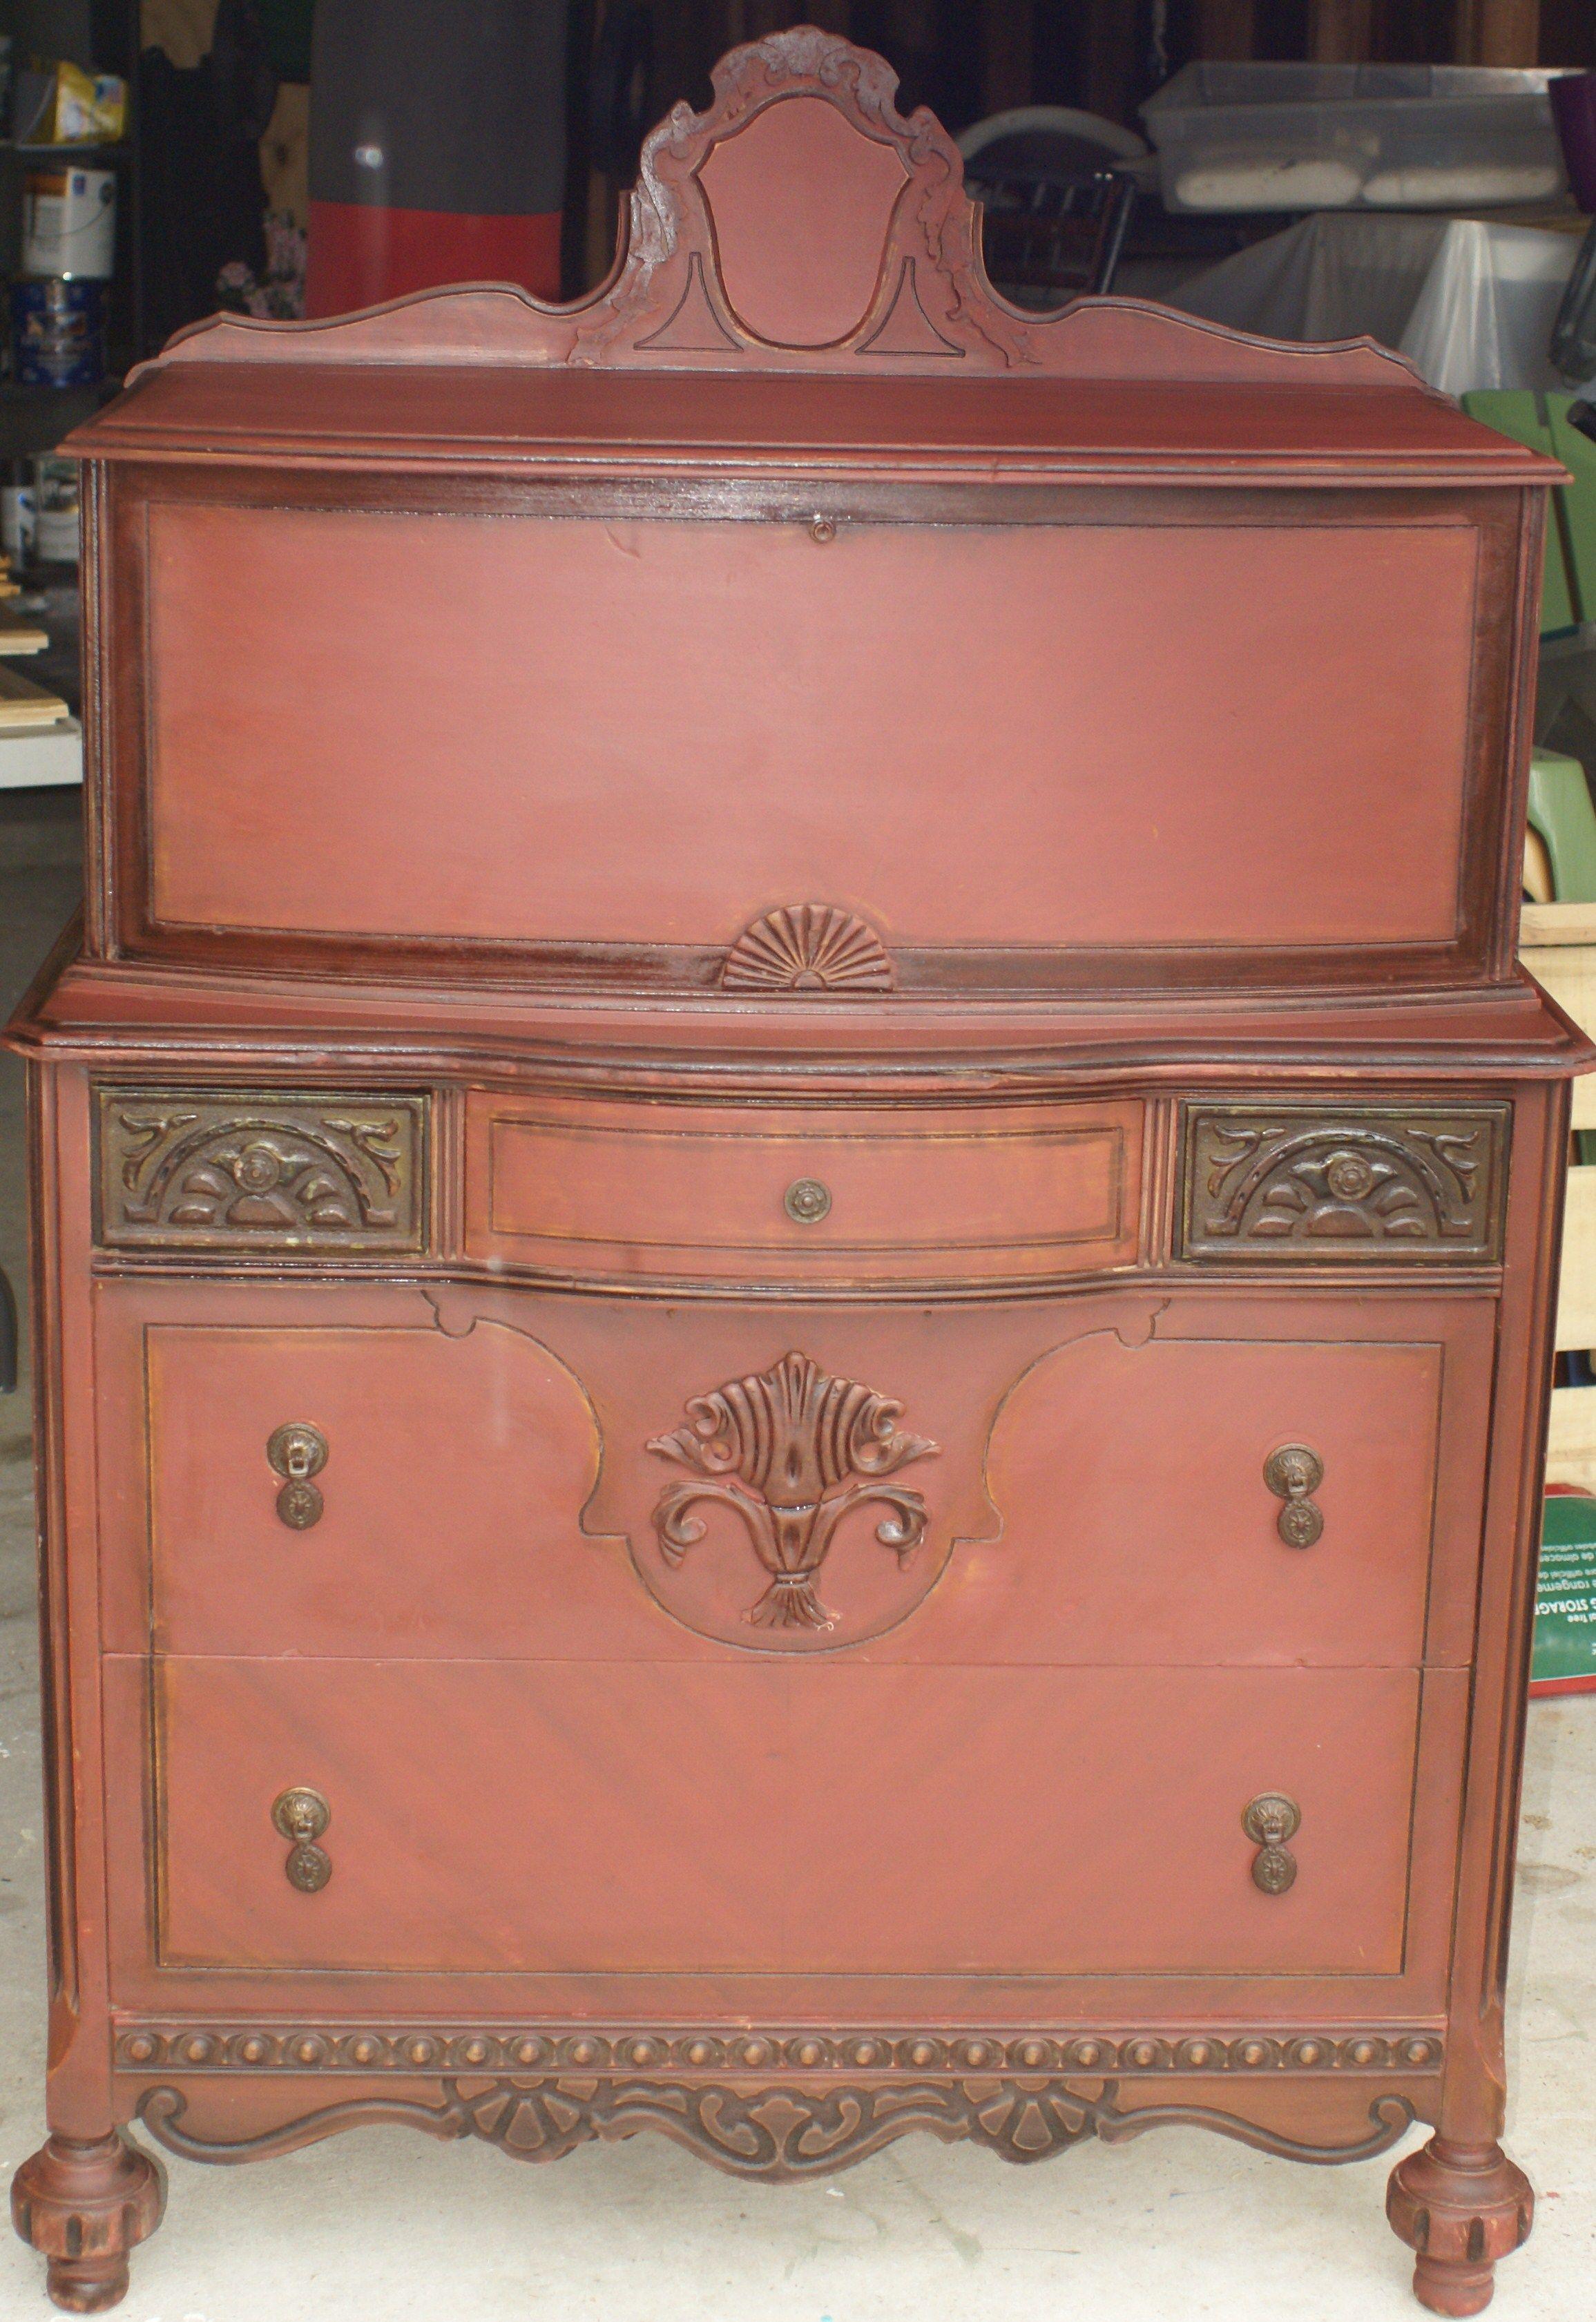 Furniture, Antique dresser, Decor